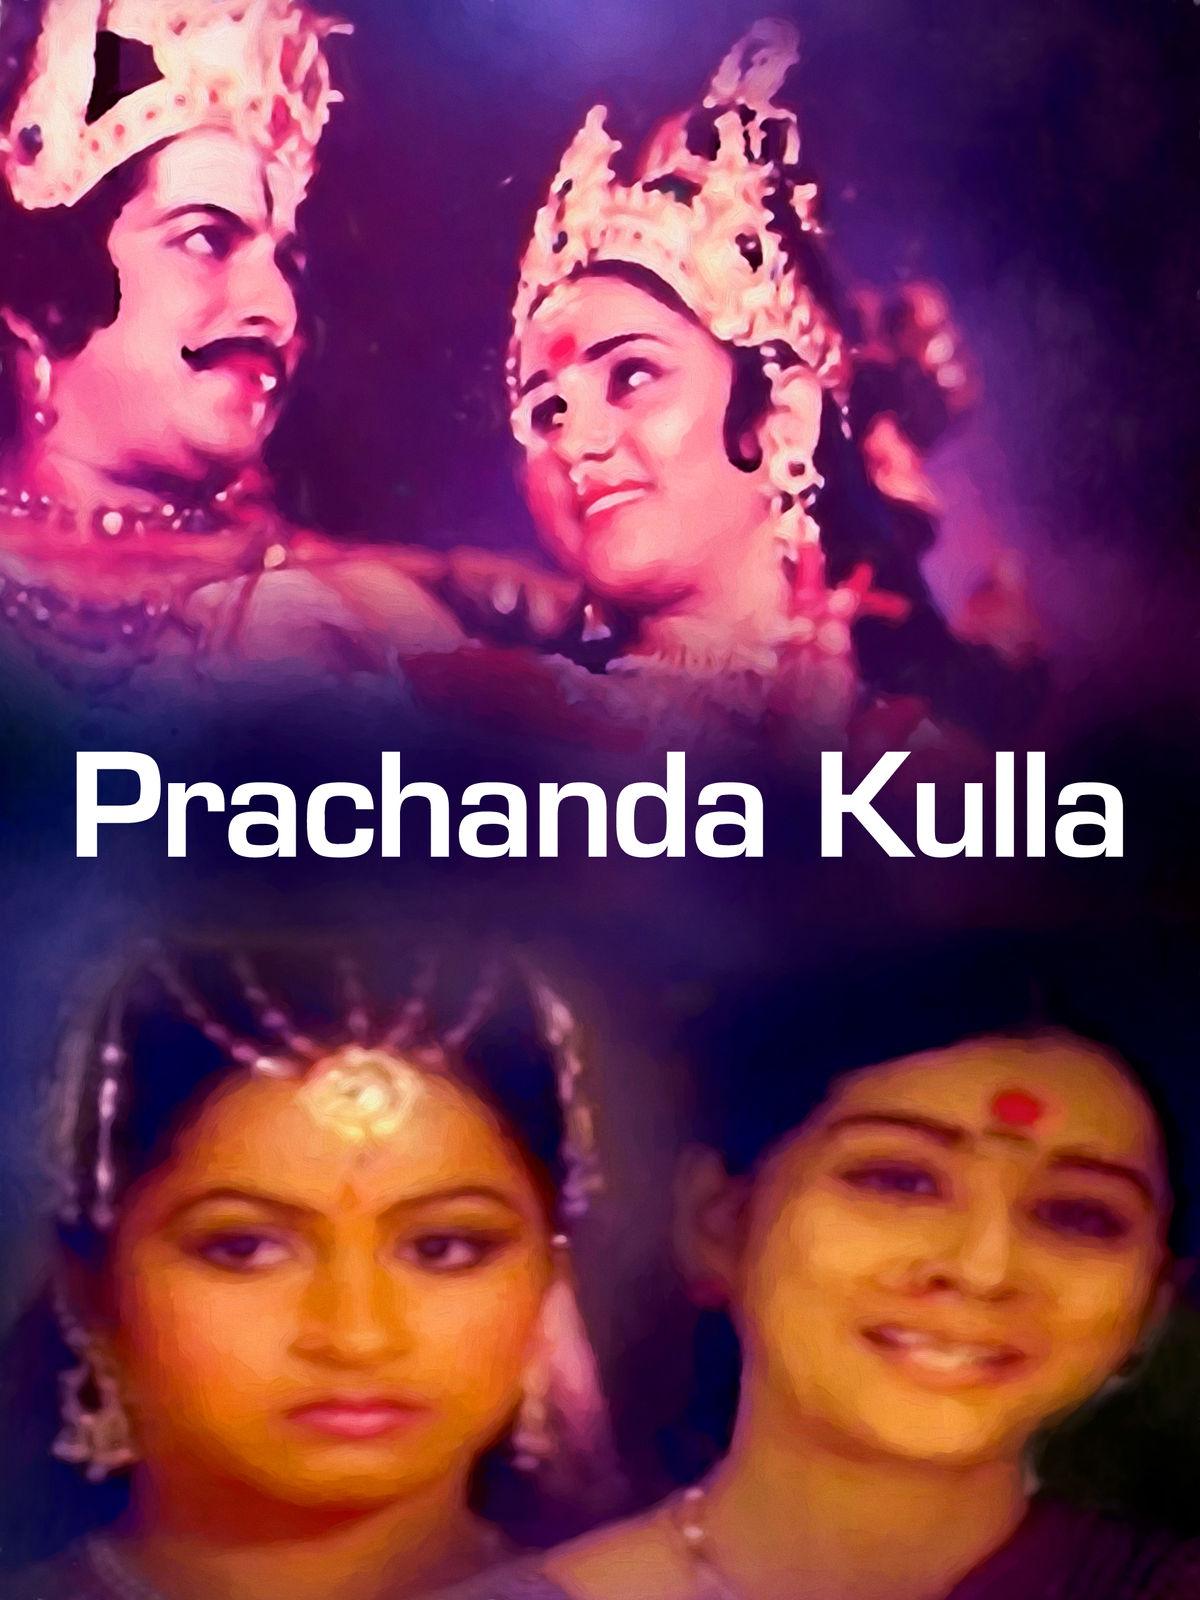 Prachanda Kulla